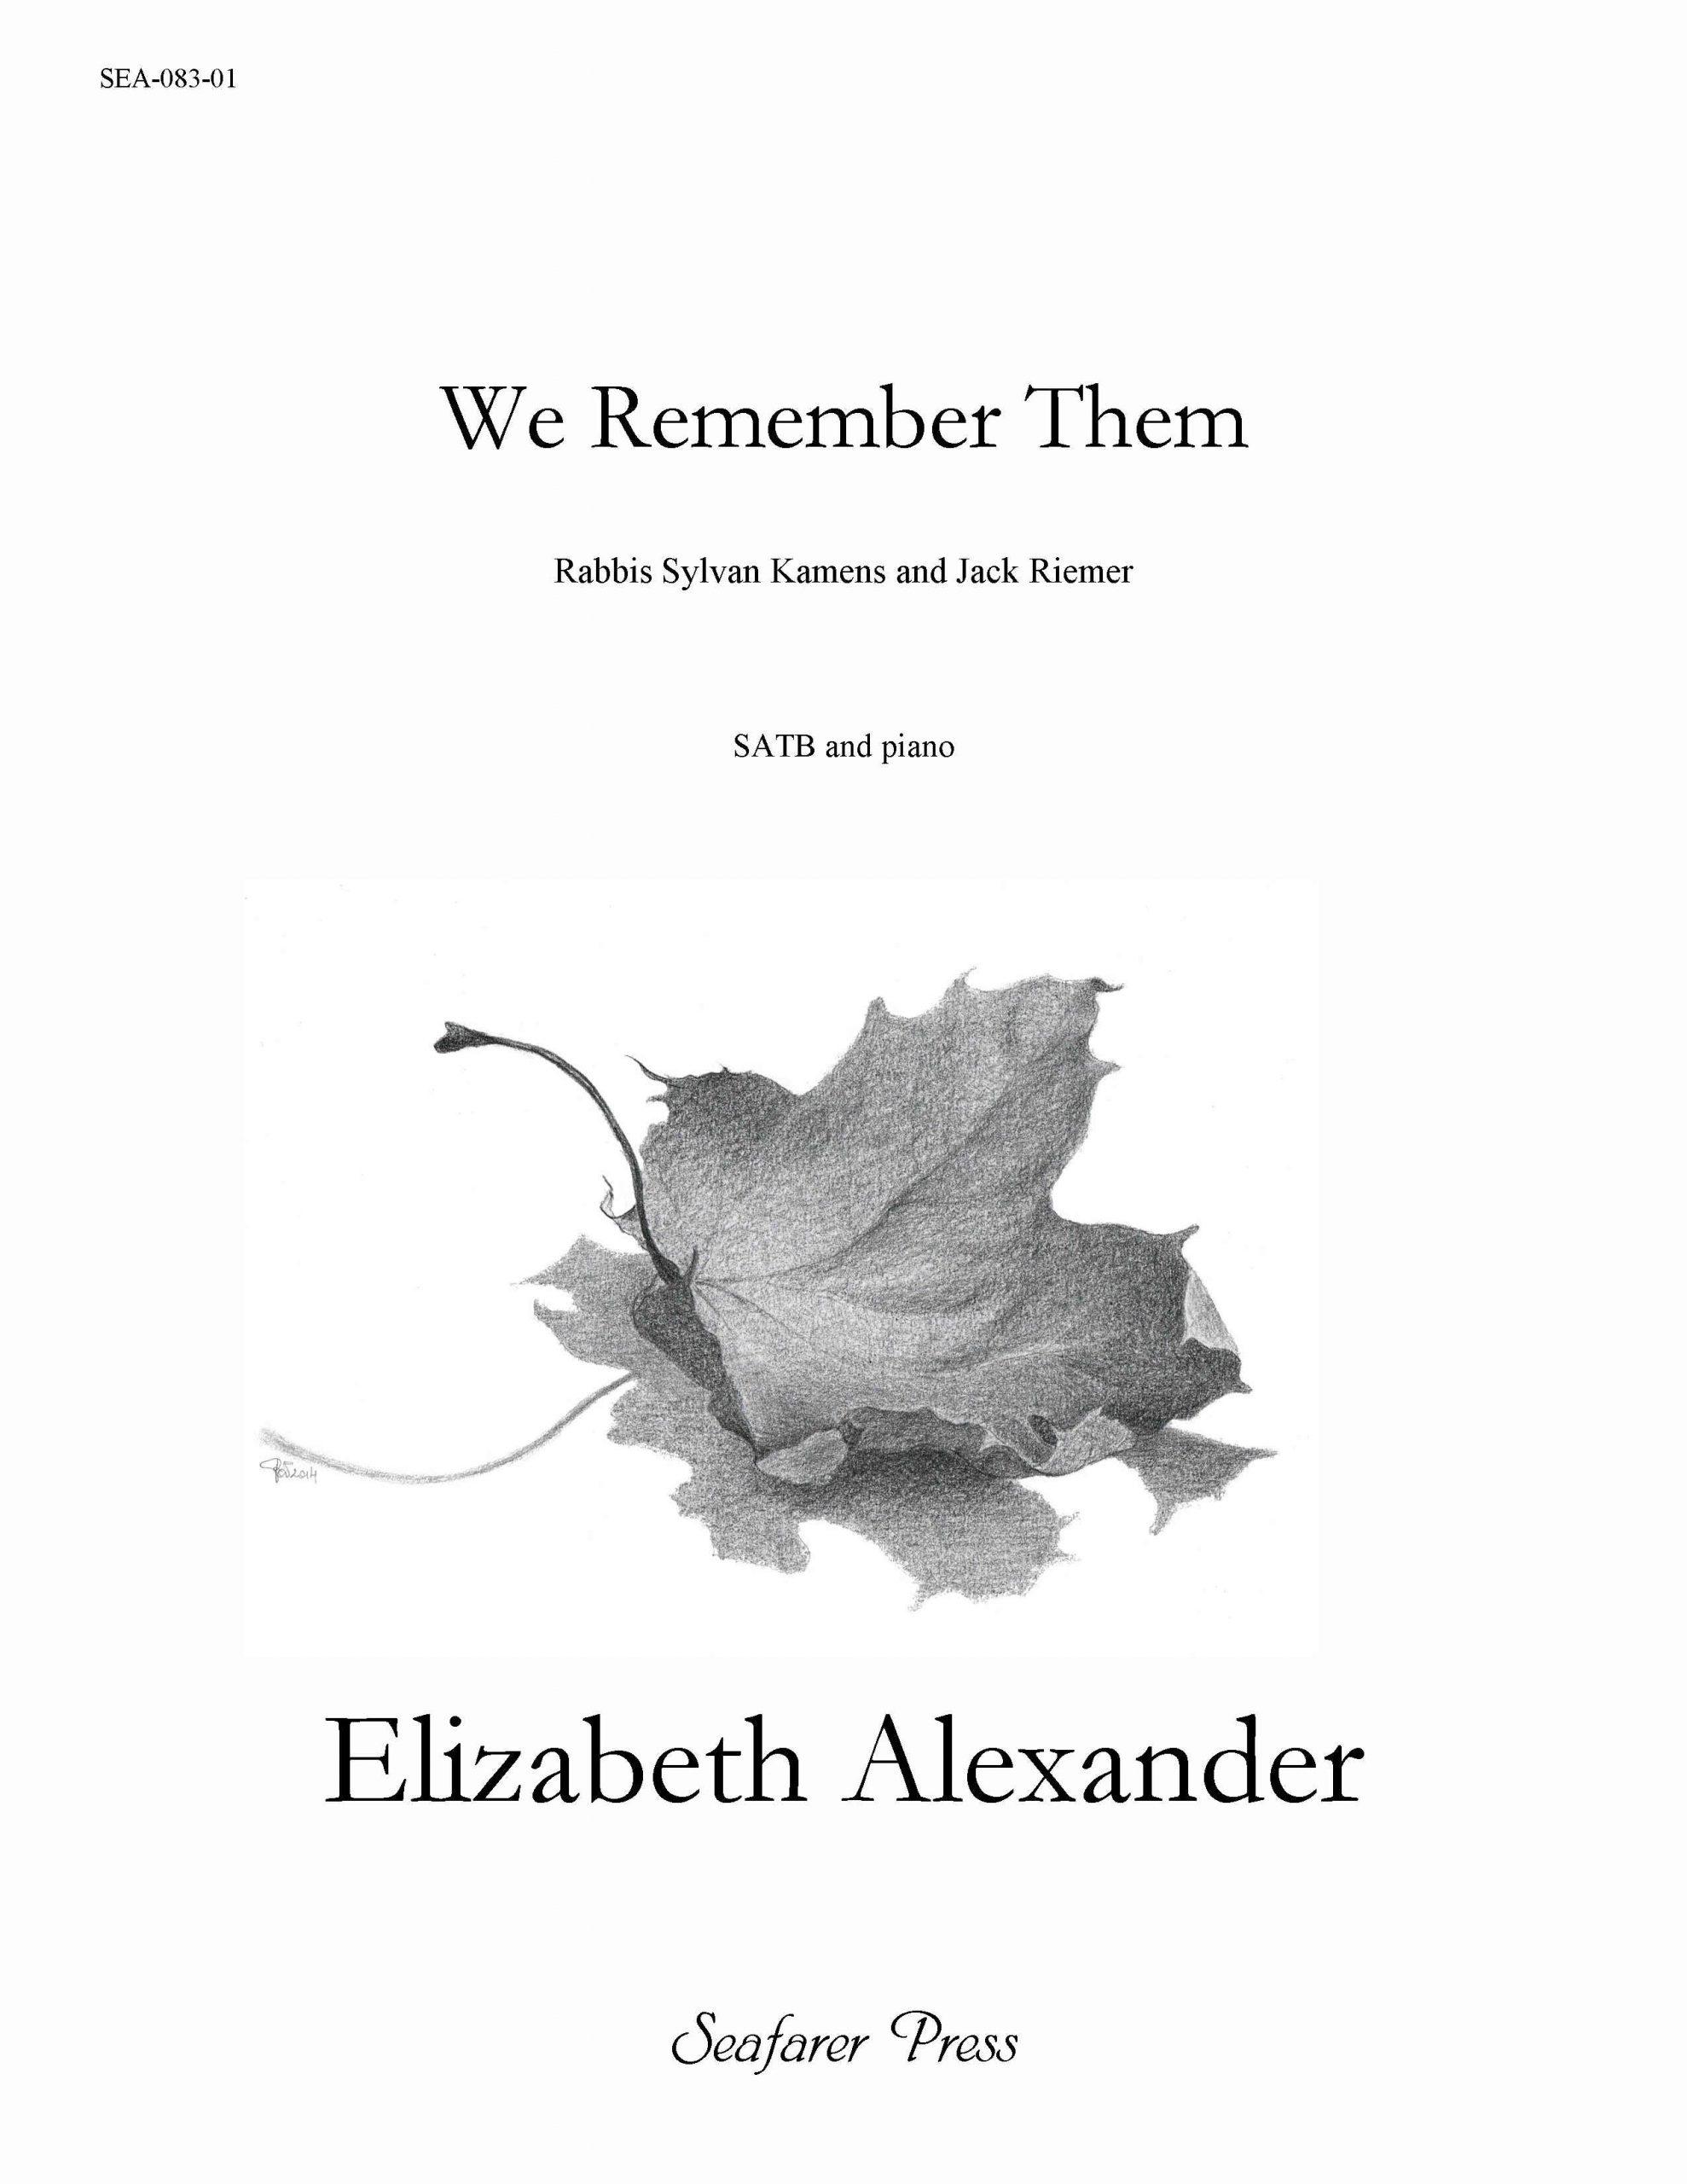 SEA-083-01 - We Remember Them